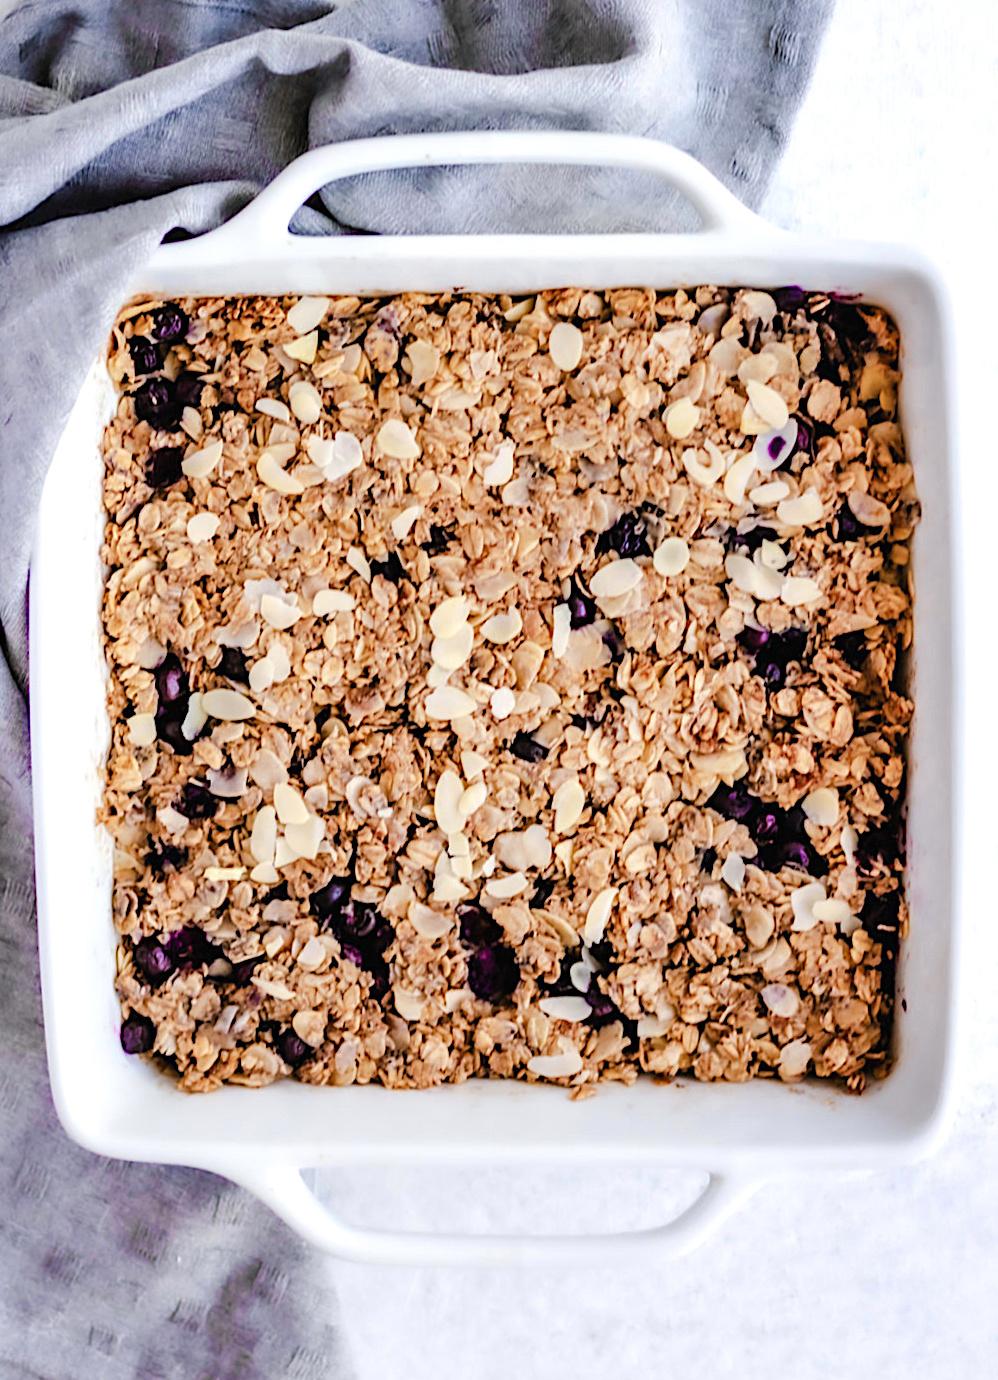 Easy 20 Minute Baked Oatmeal Recipe